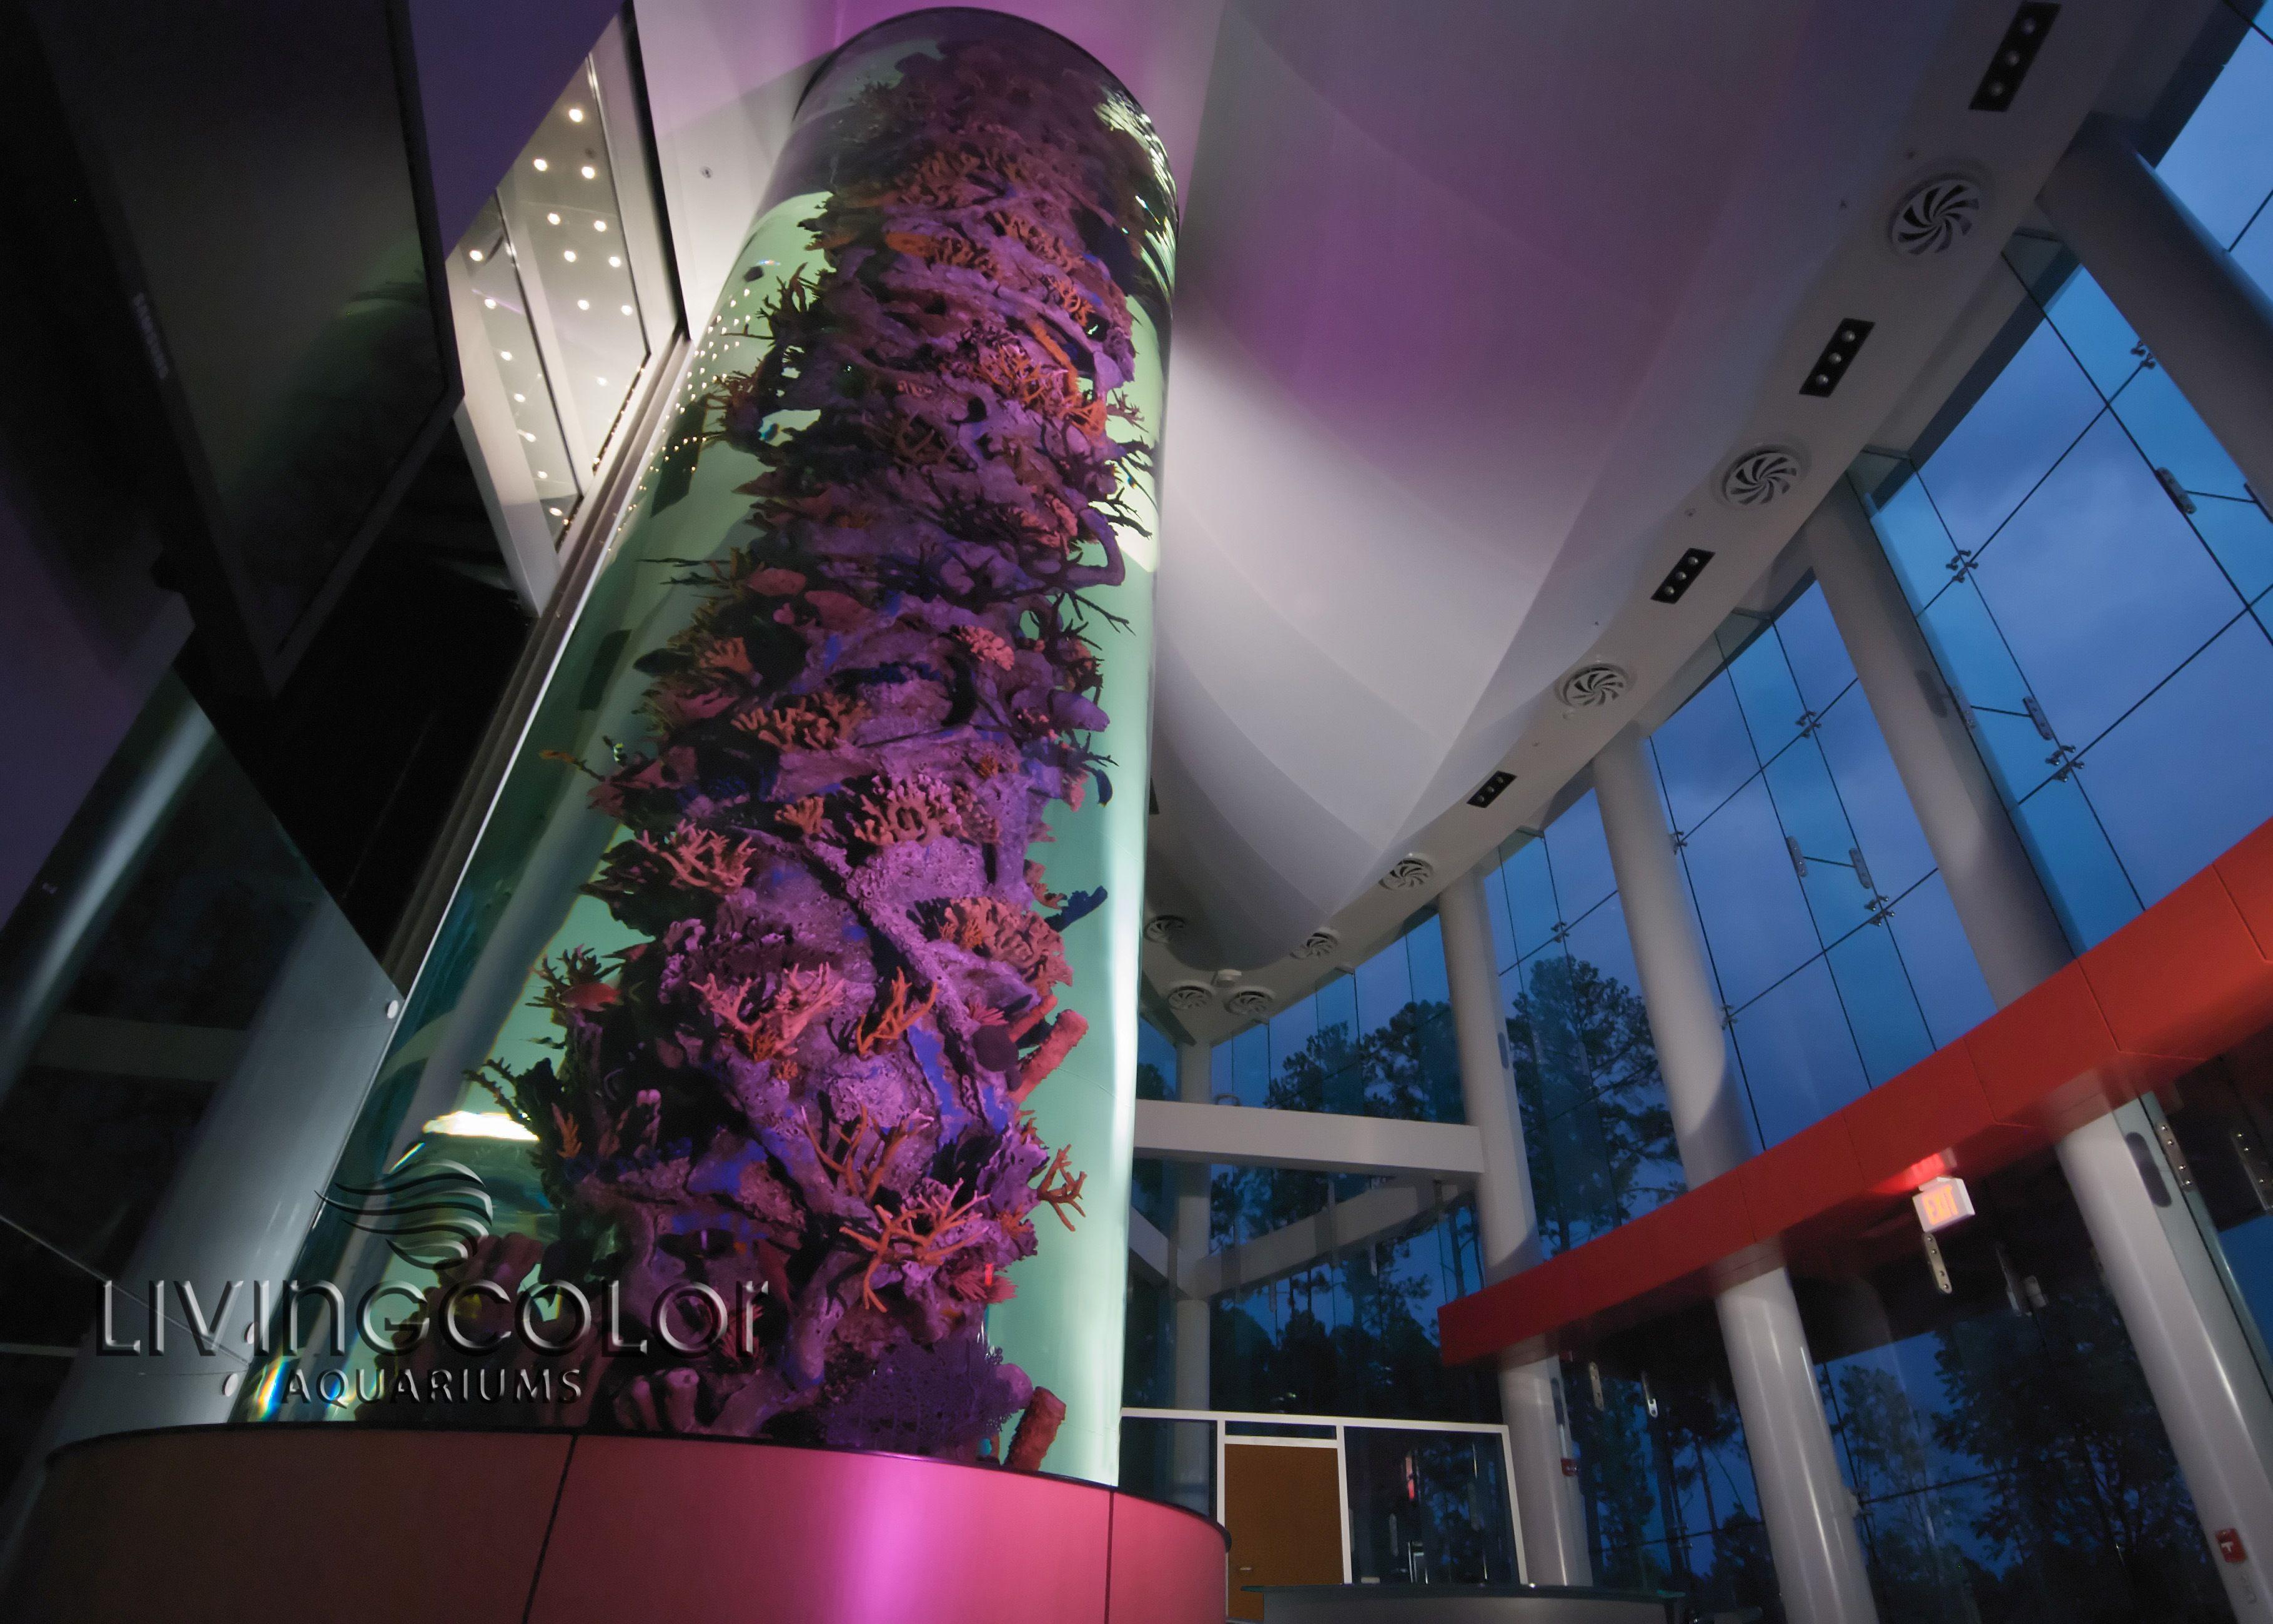 Living color aquarium fish tank kings - Living Color Aquariums Rainforest Cafe See More 900 Gallon Cylinder Tank